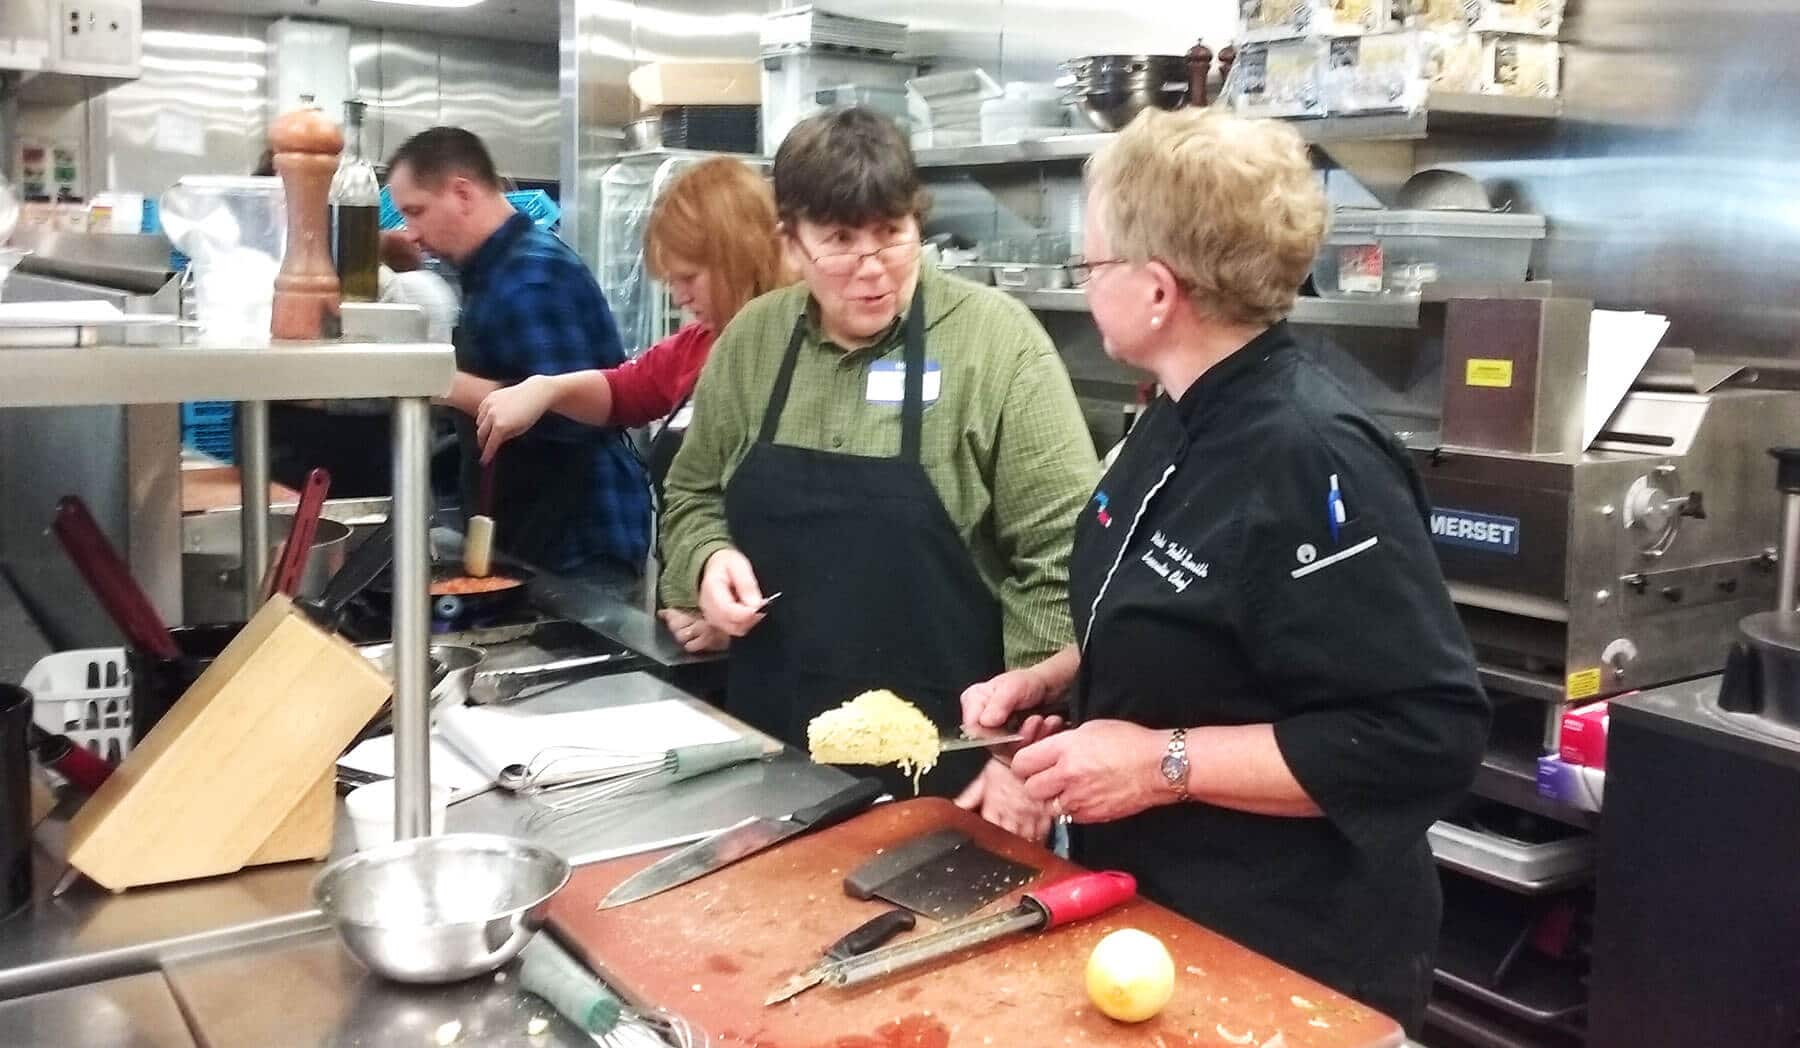 Chef Vicki Todd Smith teaches her Polenta, Pasta and Potatoes class